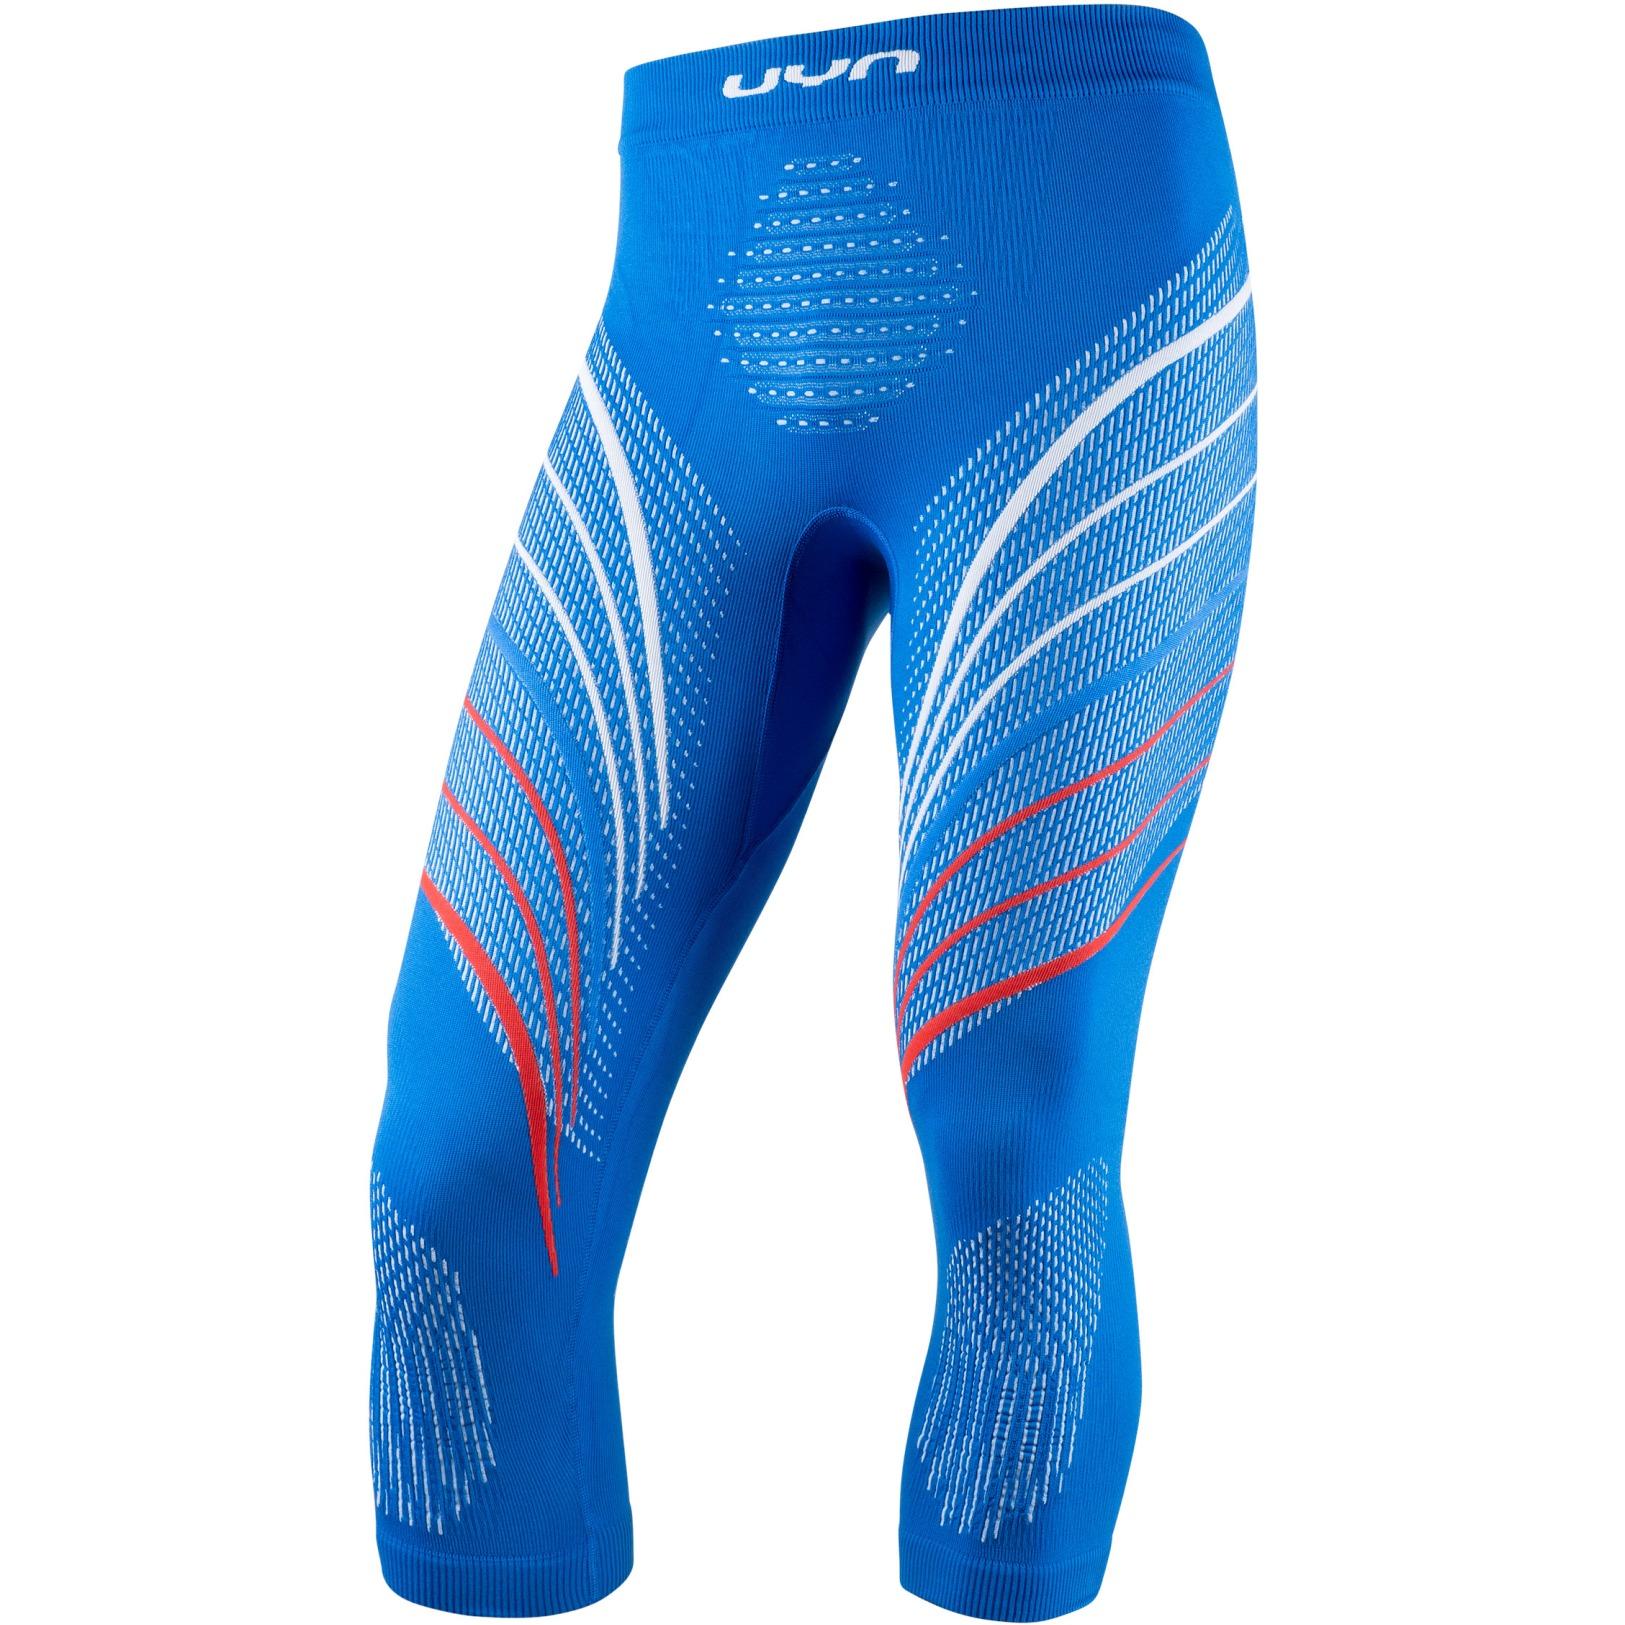 Image of UYN Natyon 2.0 Russia Underwear Pants Medium - Russia